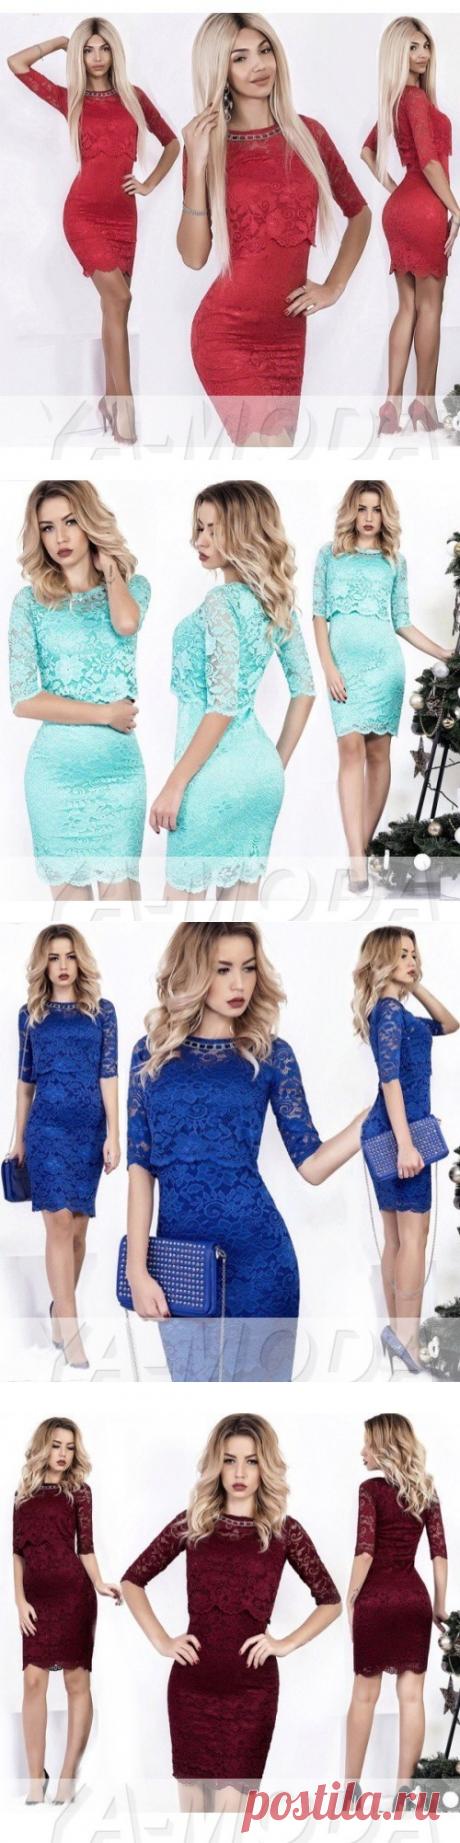 Комплект платье и кофточка